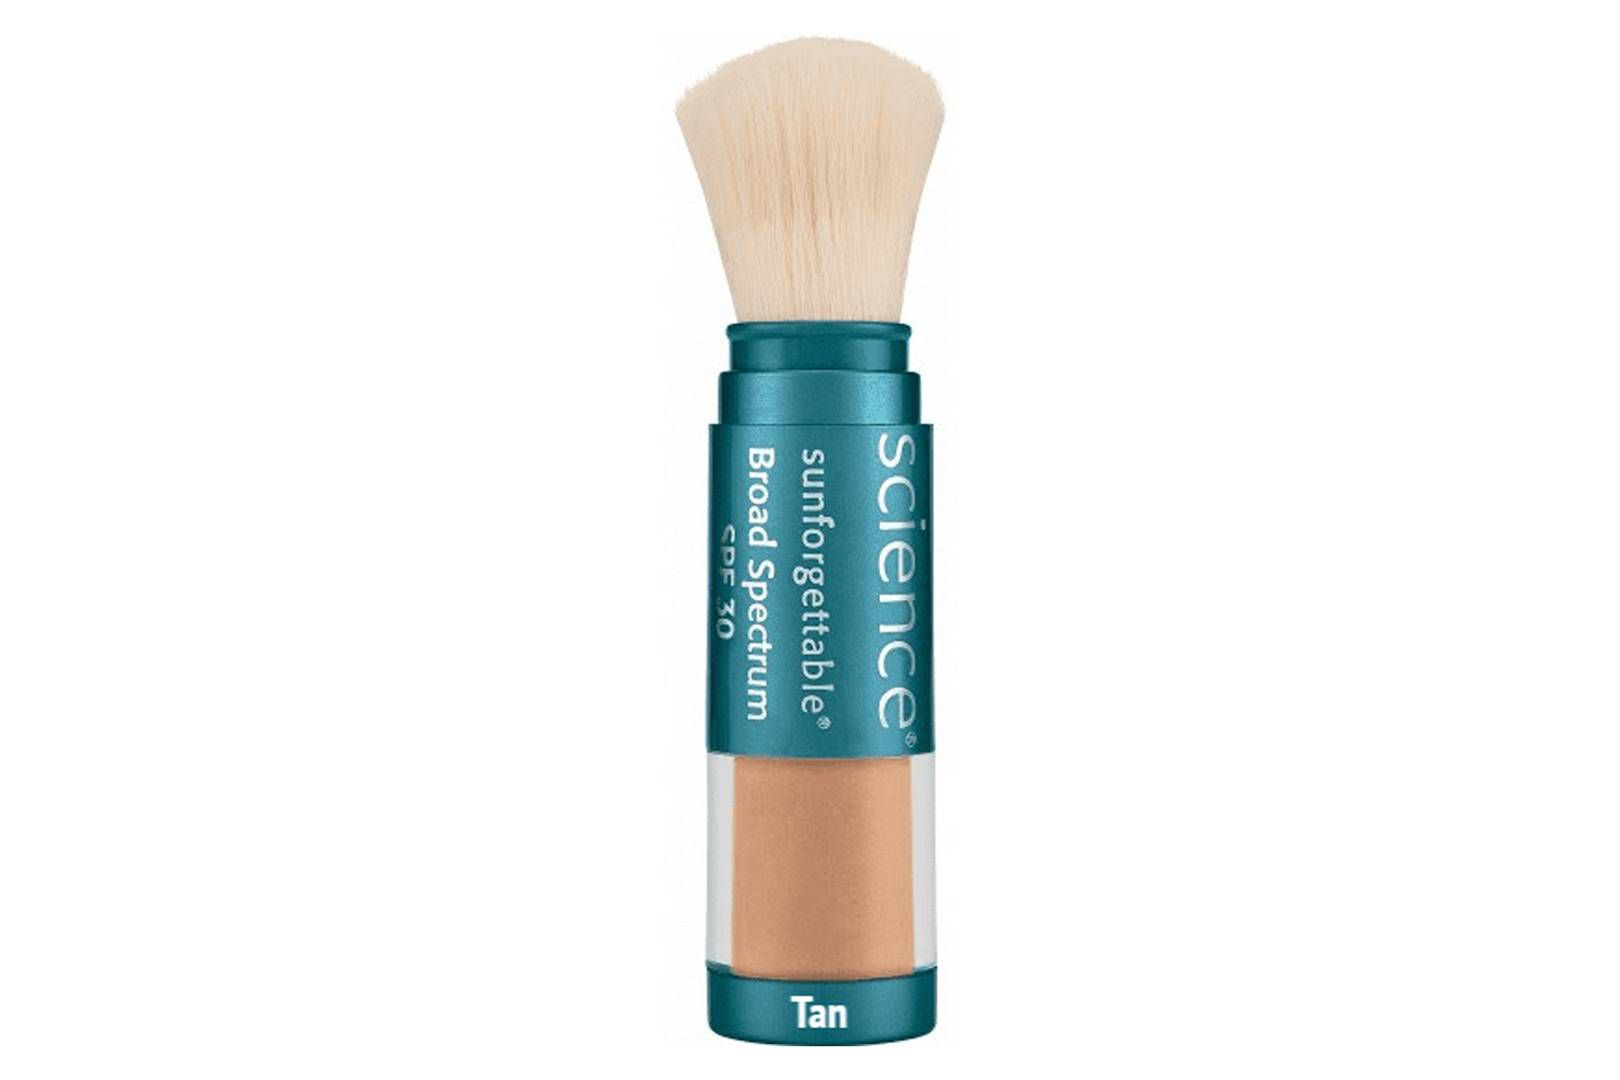 colorscience powder sunscreen